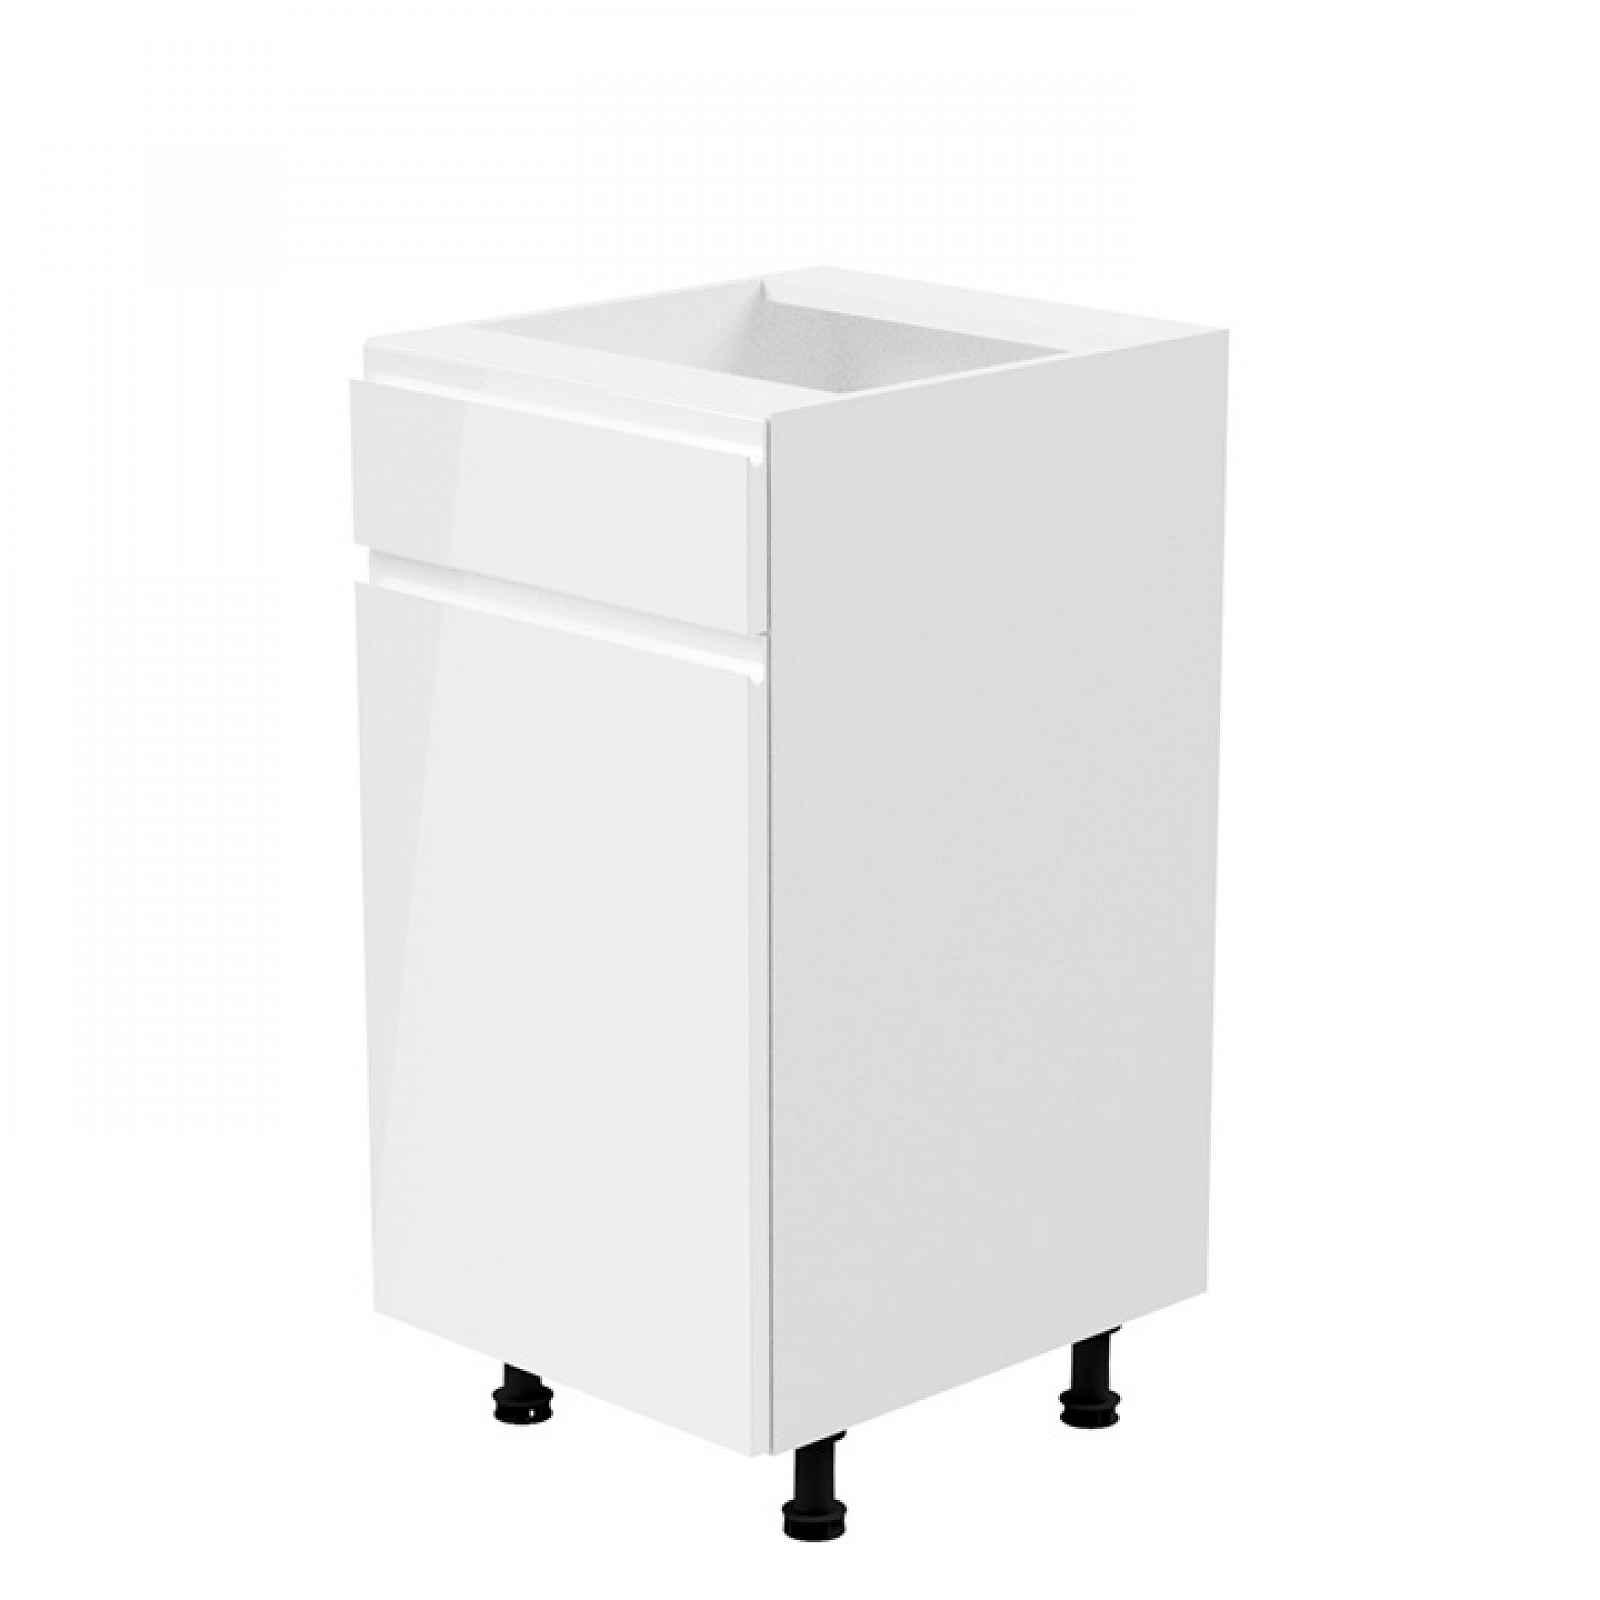 Spodní skříňka AURORA D40S1 - levá Tempo Kondela Bílá